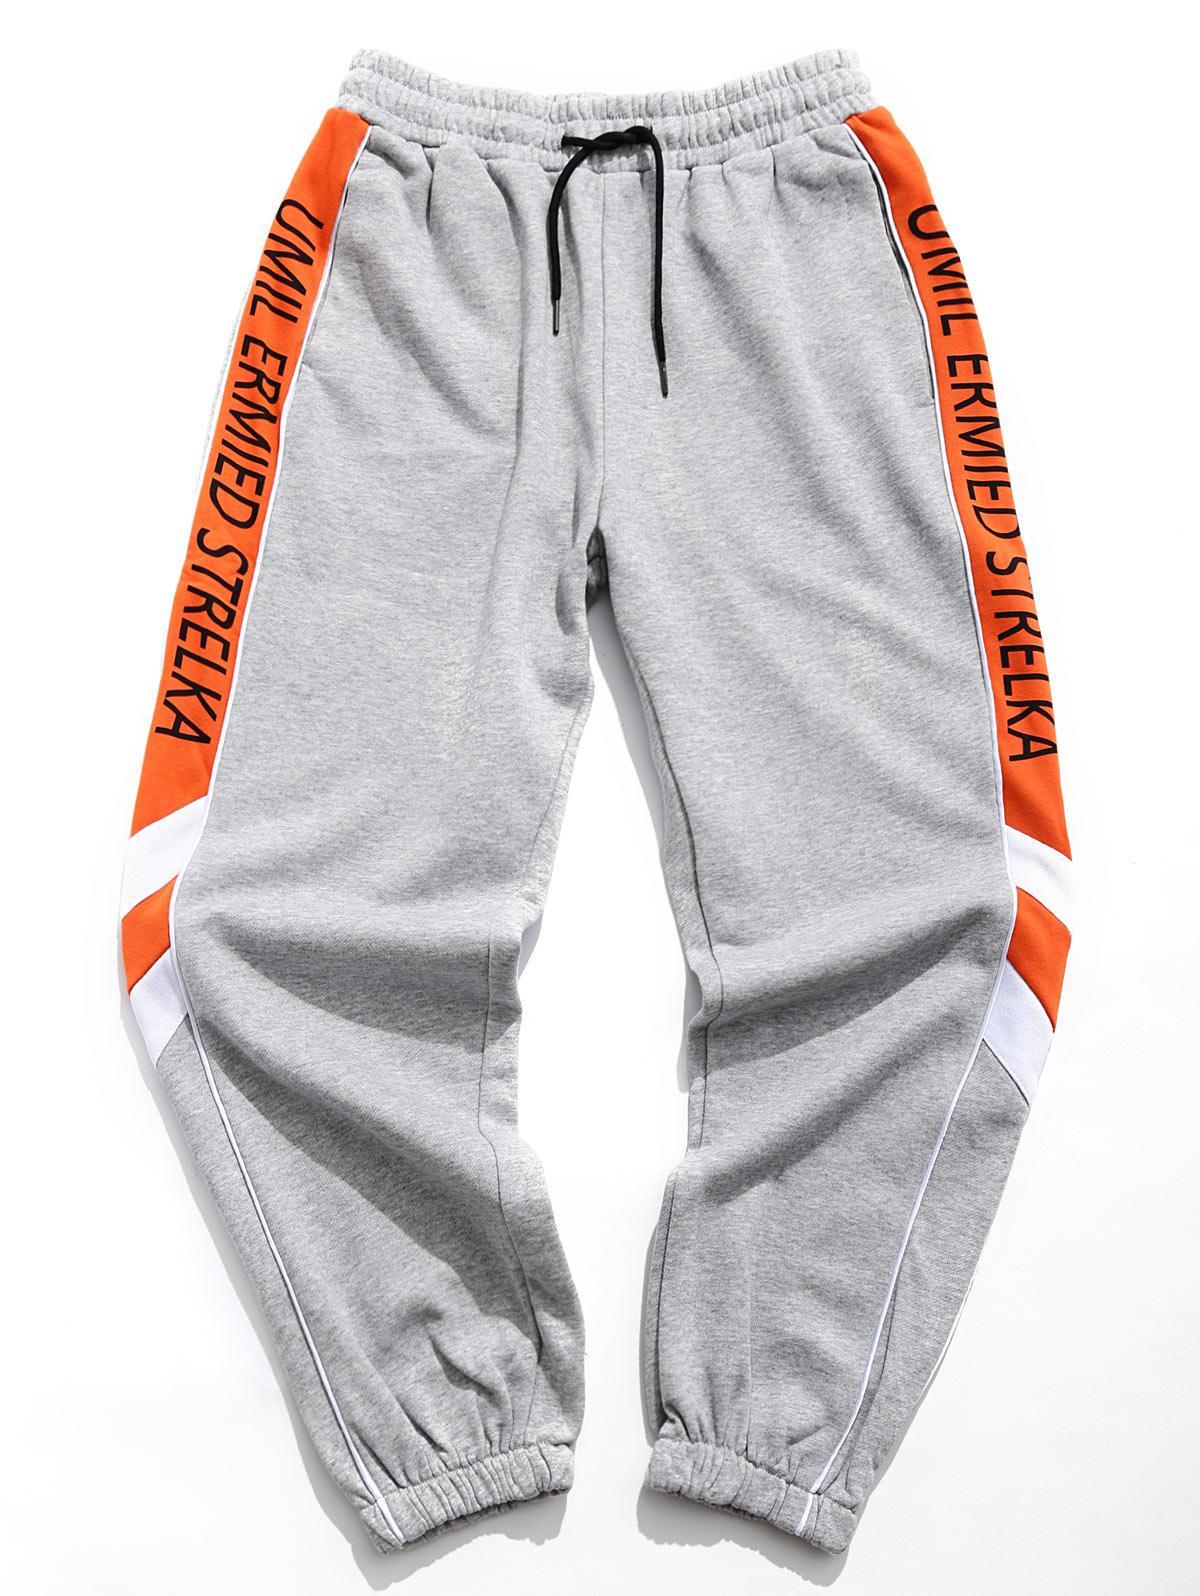 Letter Graphic Print Contrast Trim Striped Jogger Pants, Gray